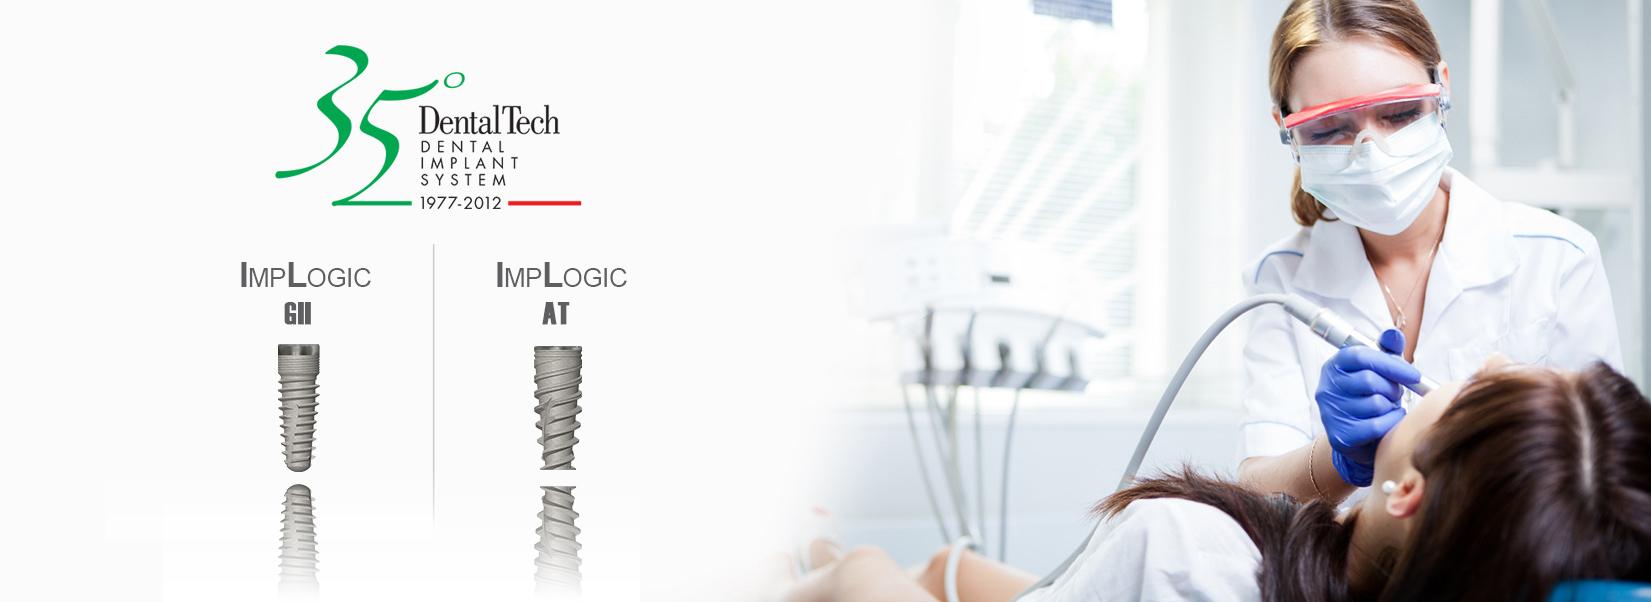 Impianti_dental_tech_ag_dental-1